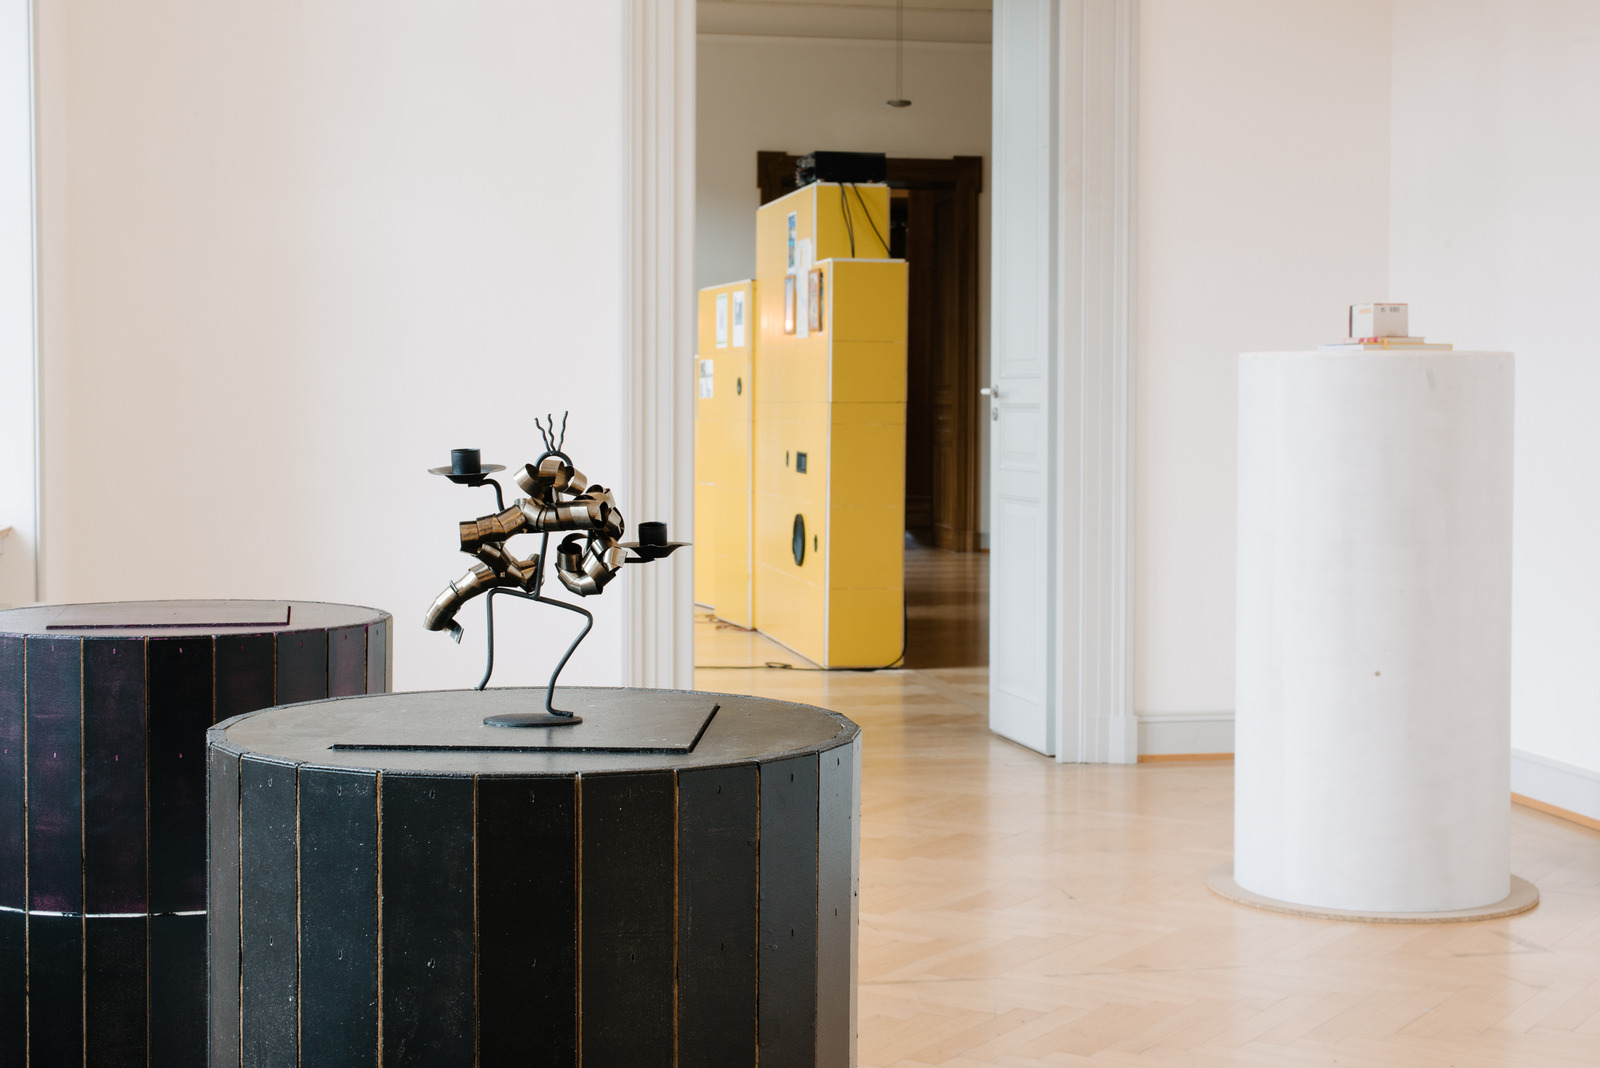 16_Installationsansicht_St.Gallen__Foto_Sebastian_Stadler